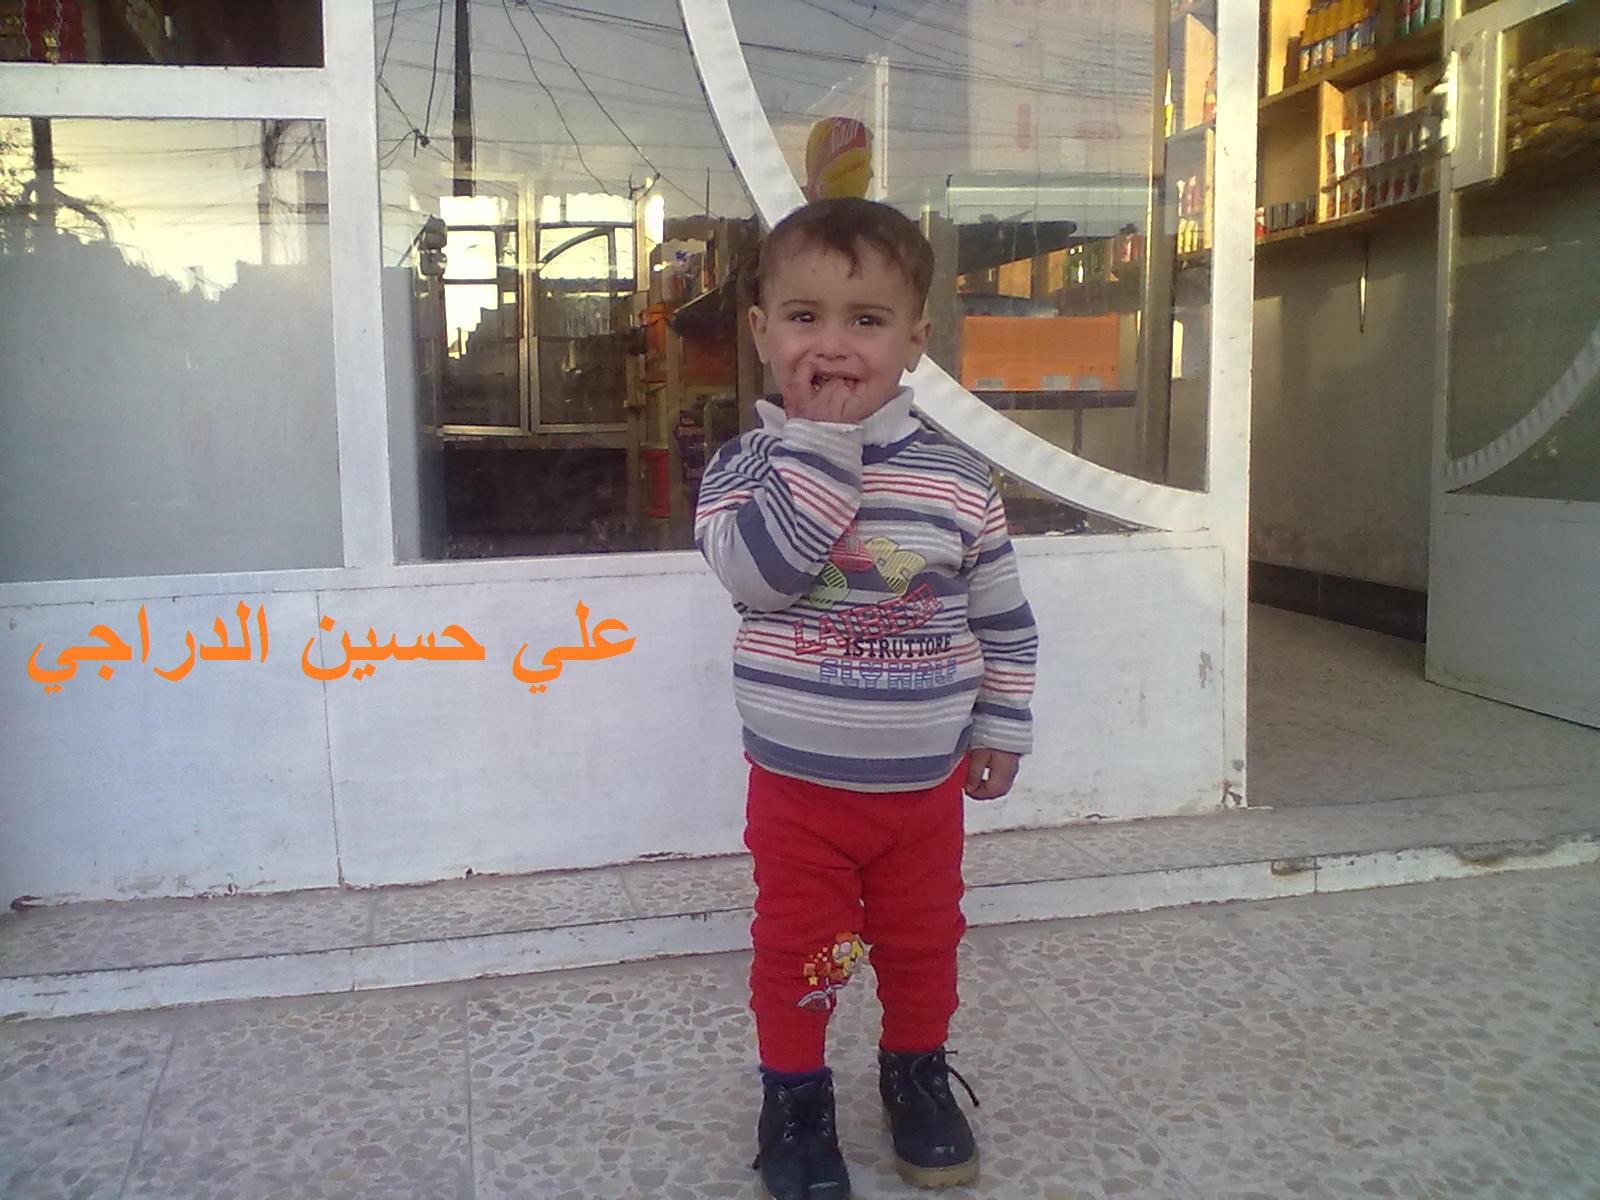 حسين الدراجي اولاد حسين الدراجي 21012060101